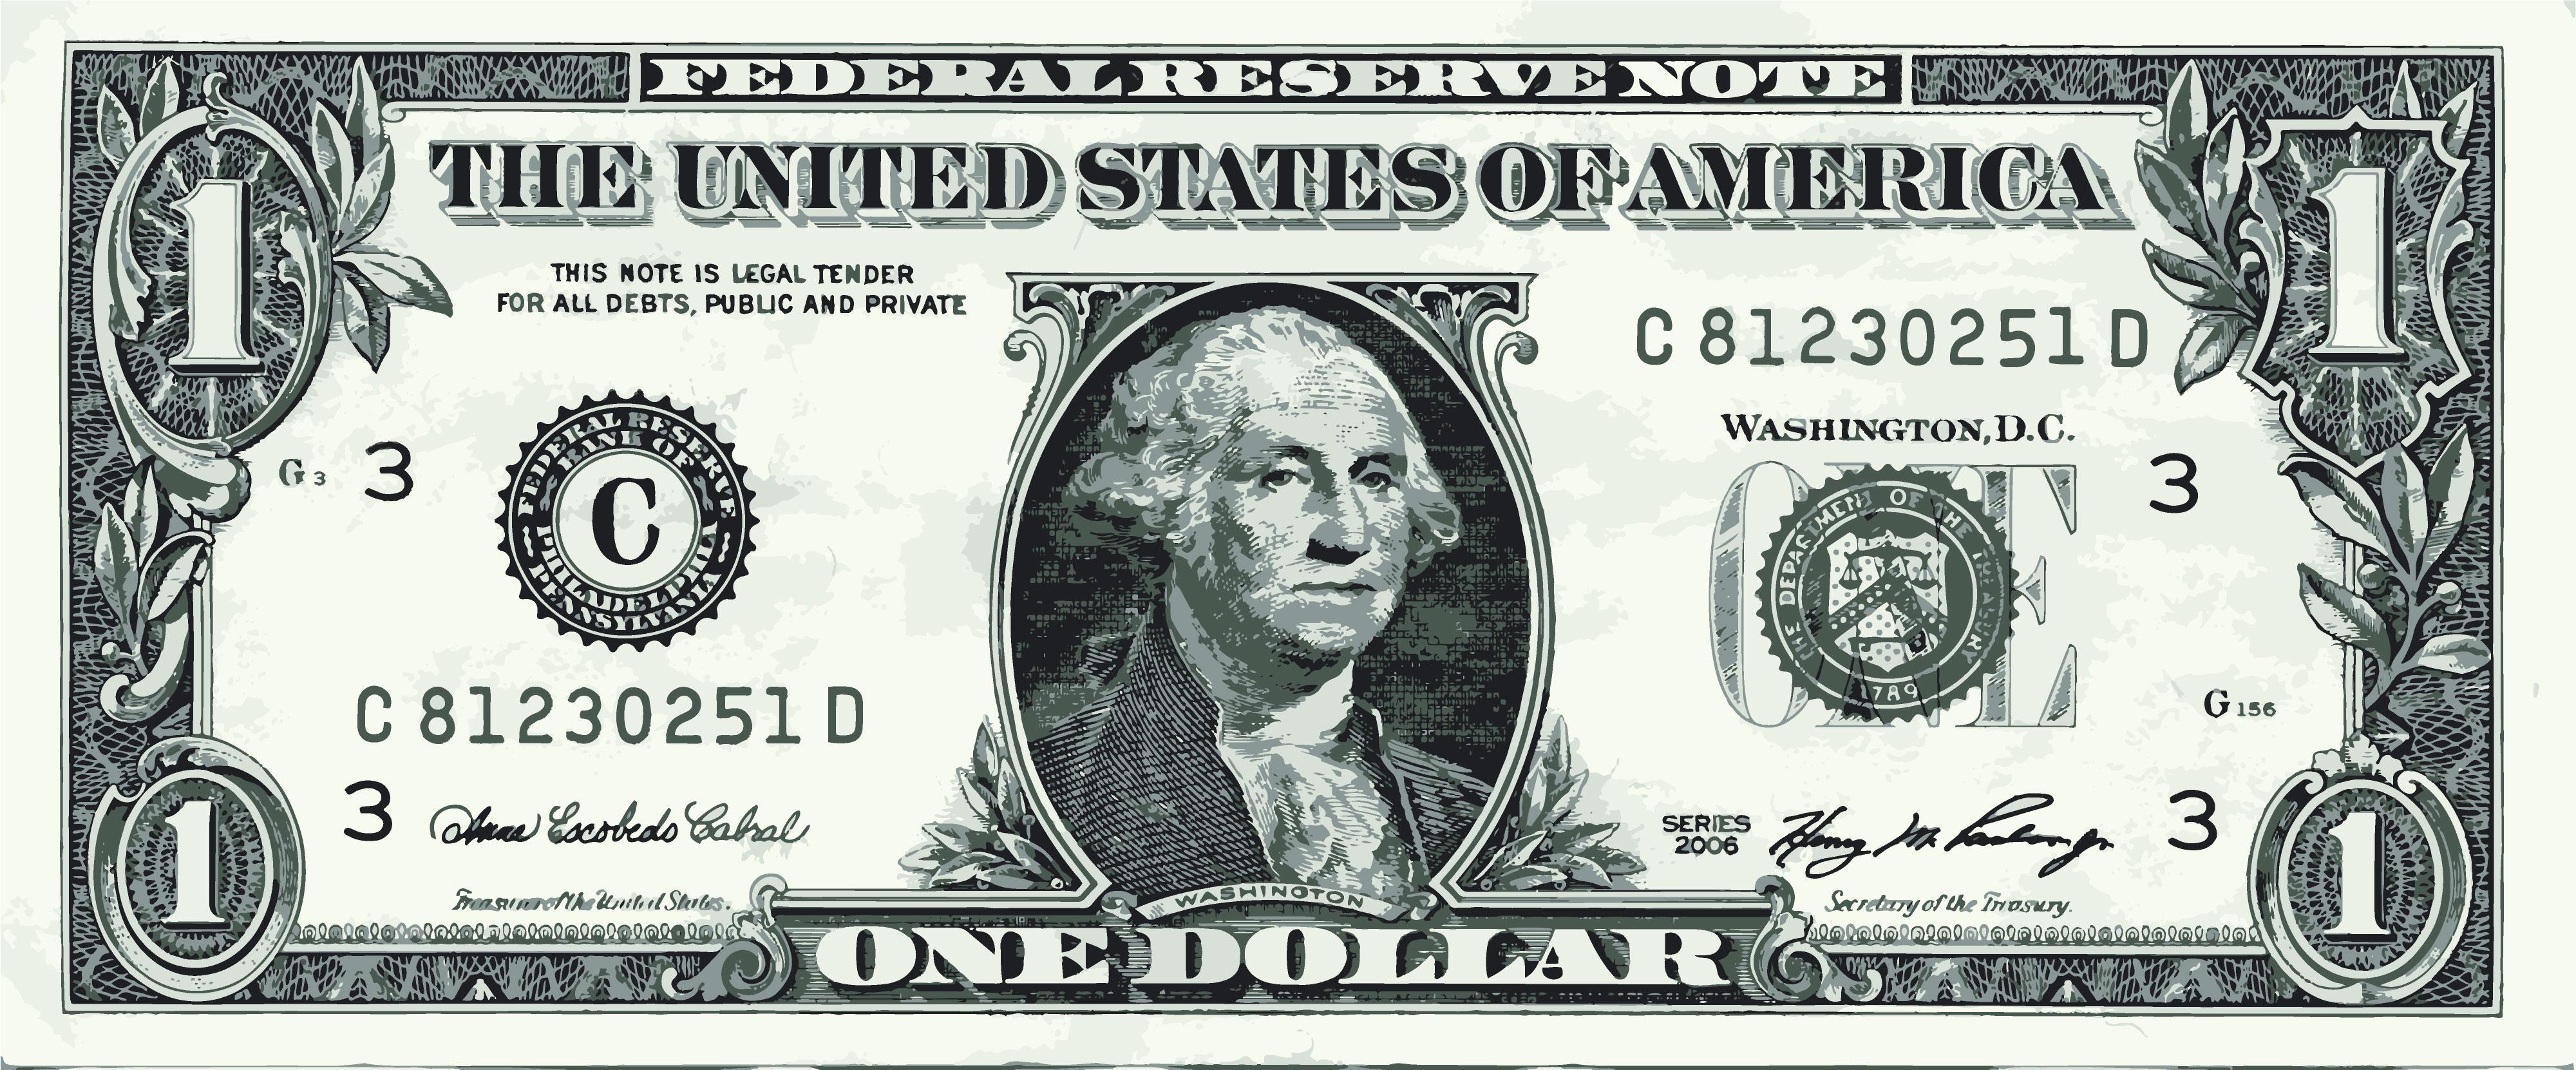 4000x1661 George Washington One Dollar Bill Vector Graphic Art Free Vector